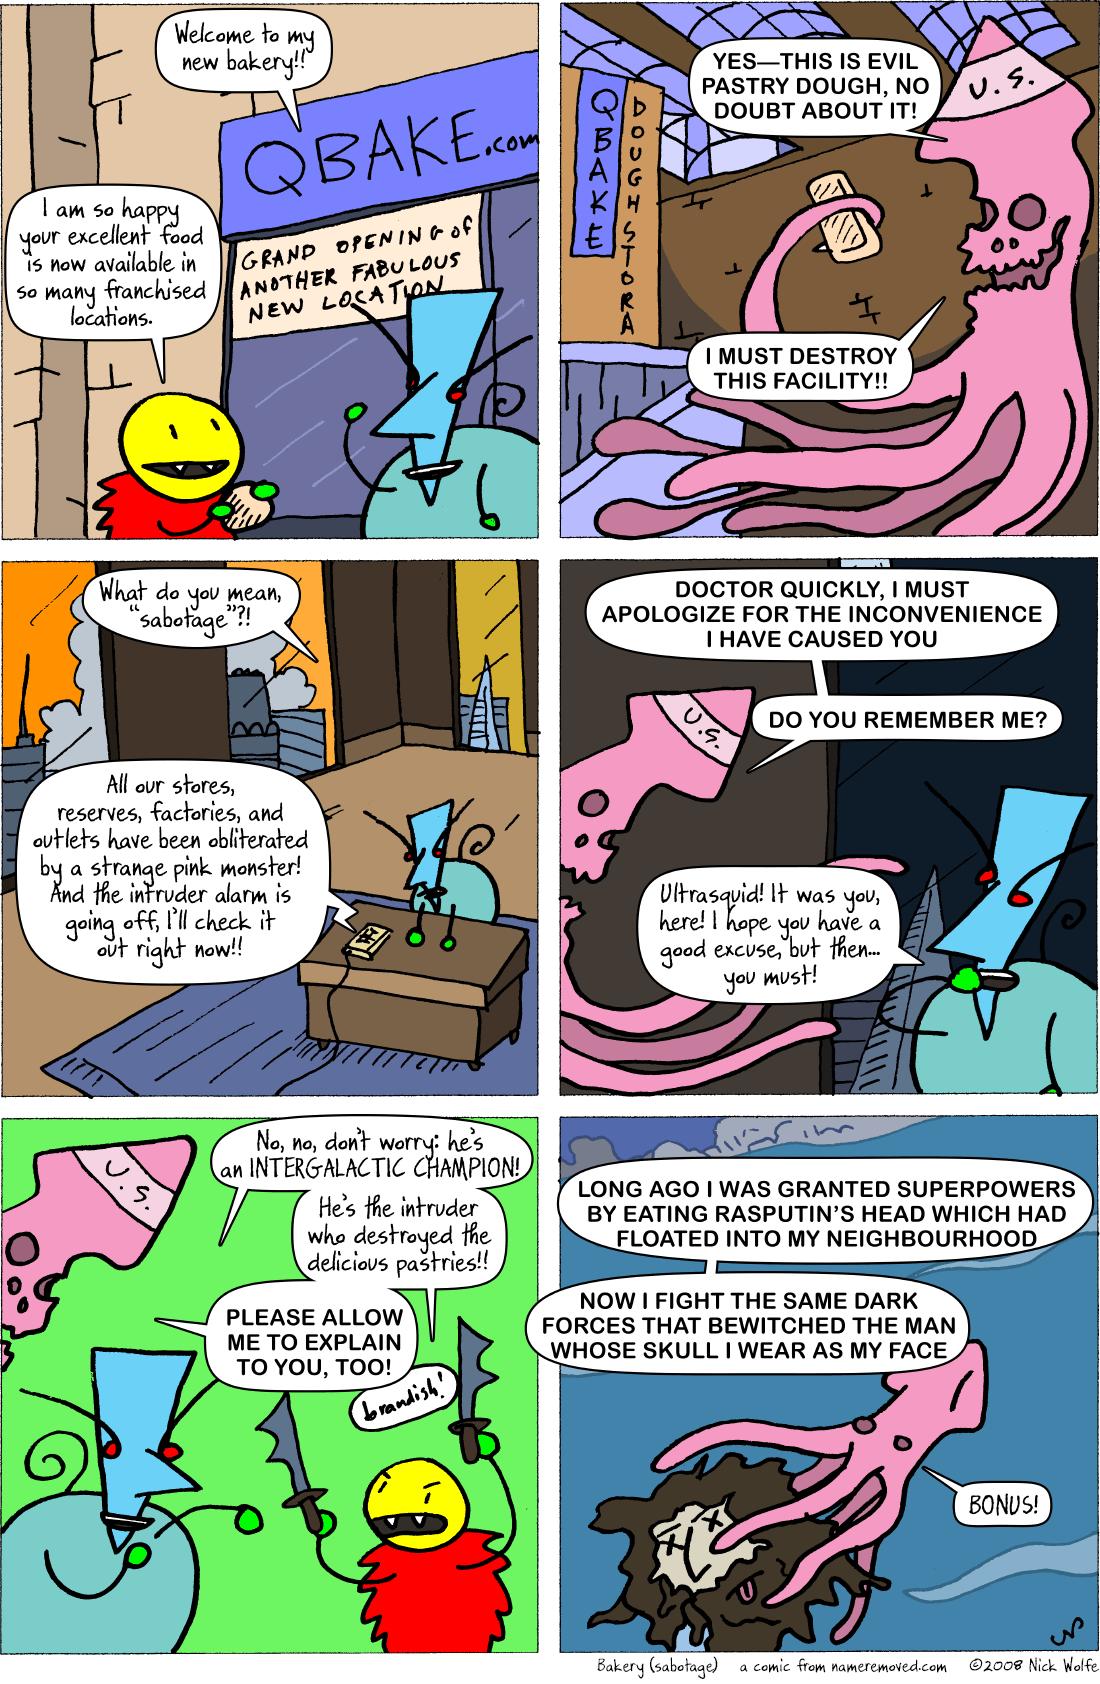 Bakery (sabotage)